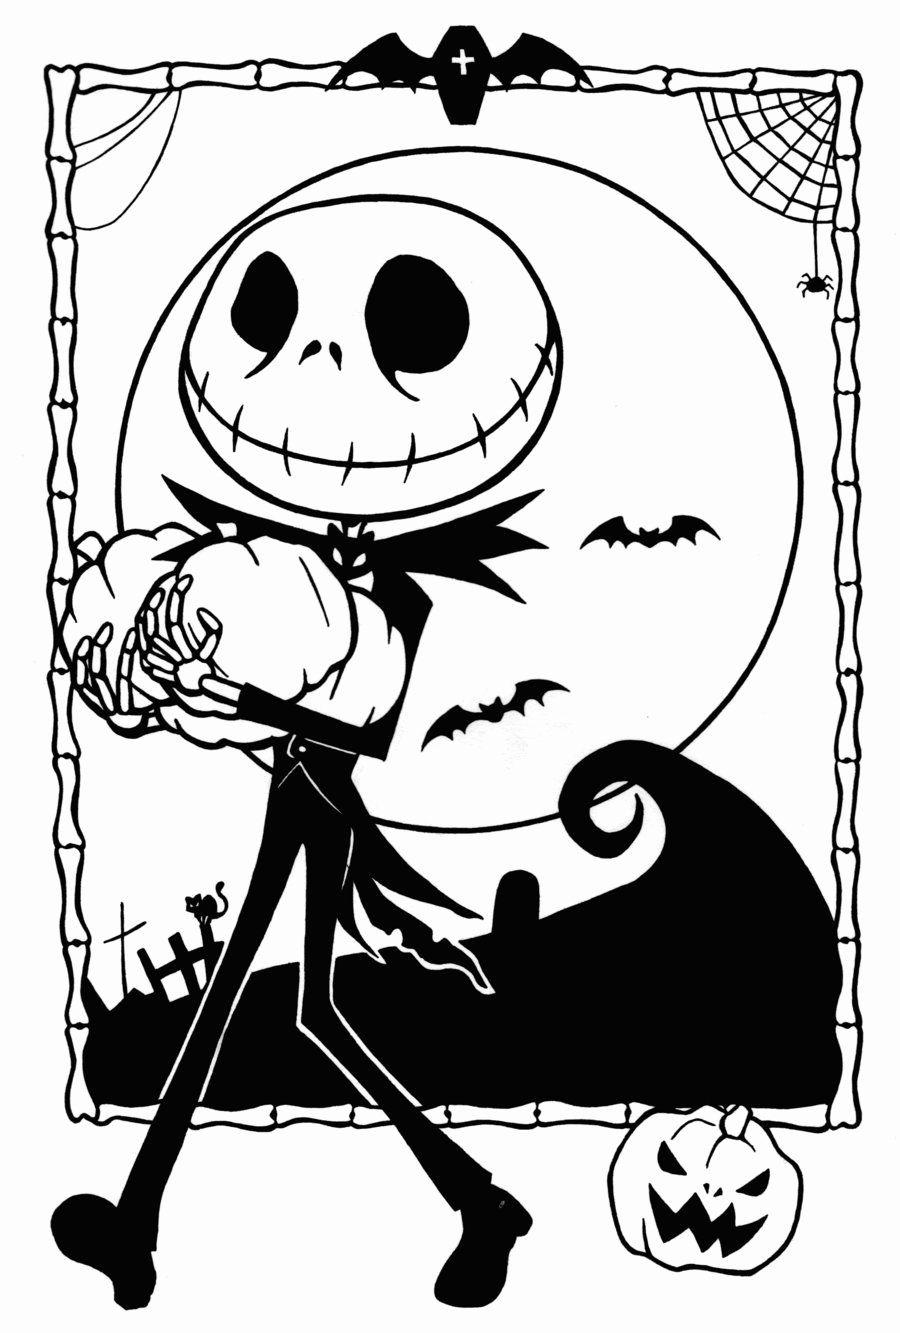 Jack Skellington Coloring Page Unique Free Printable ...